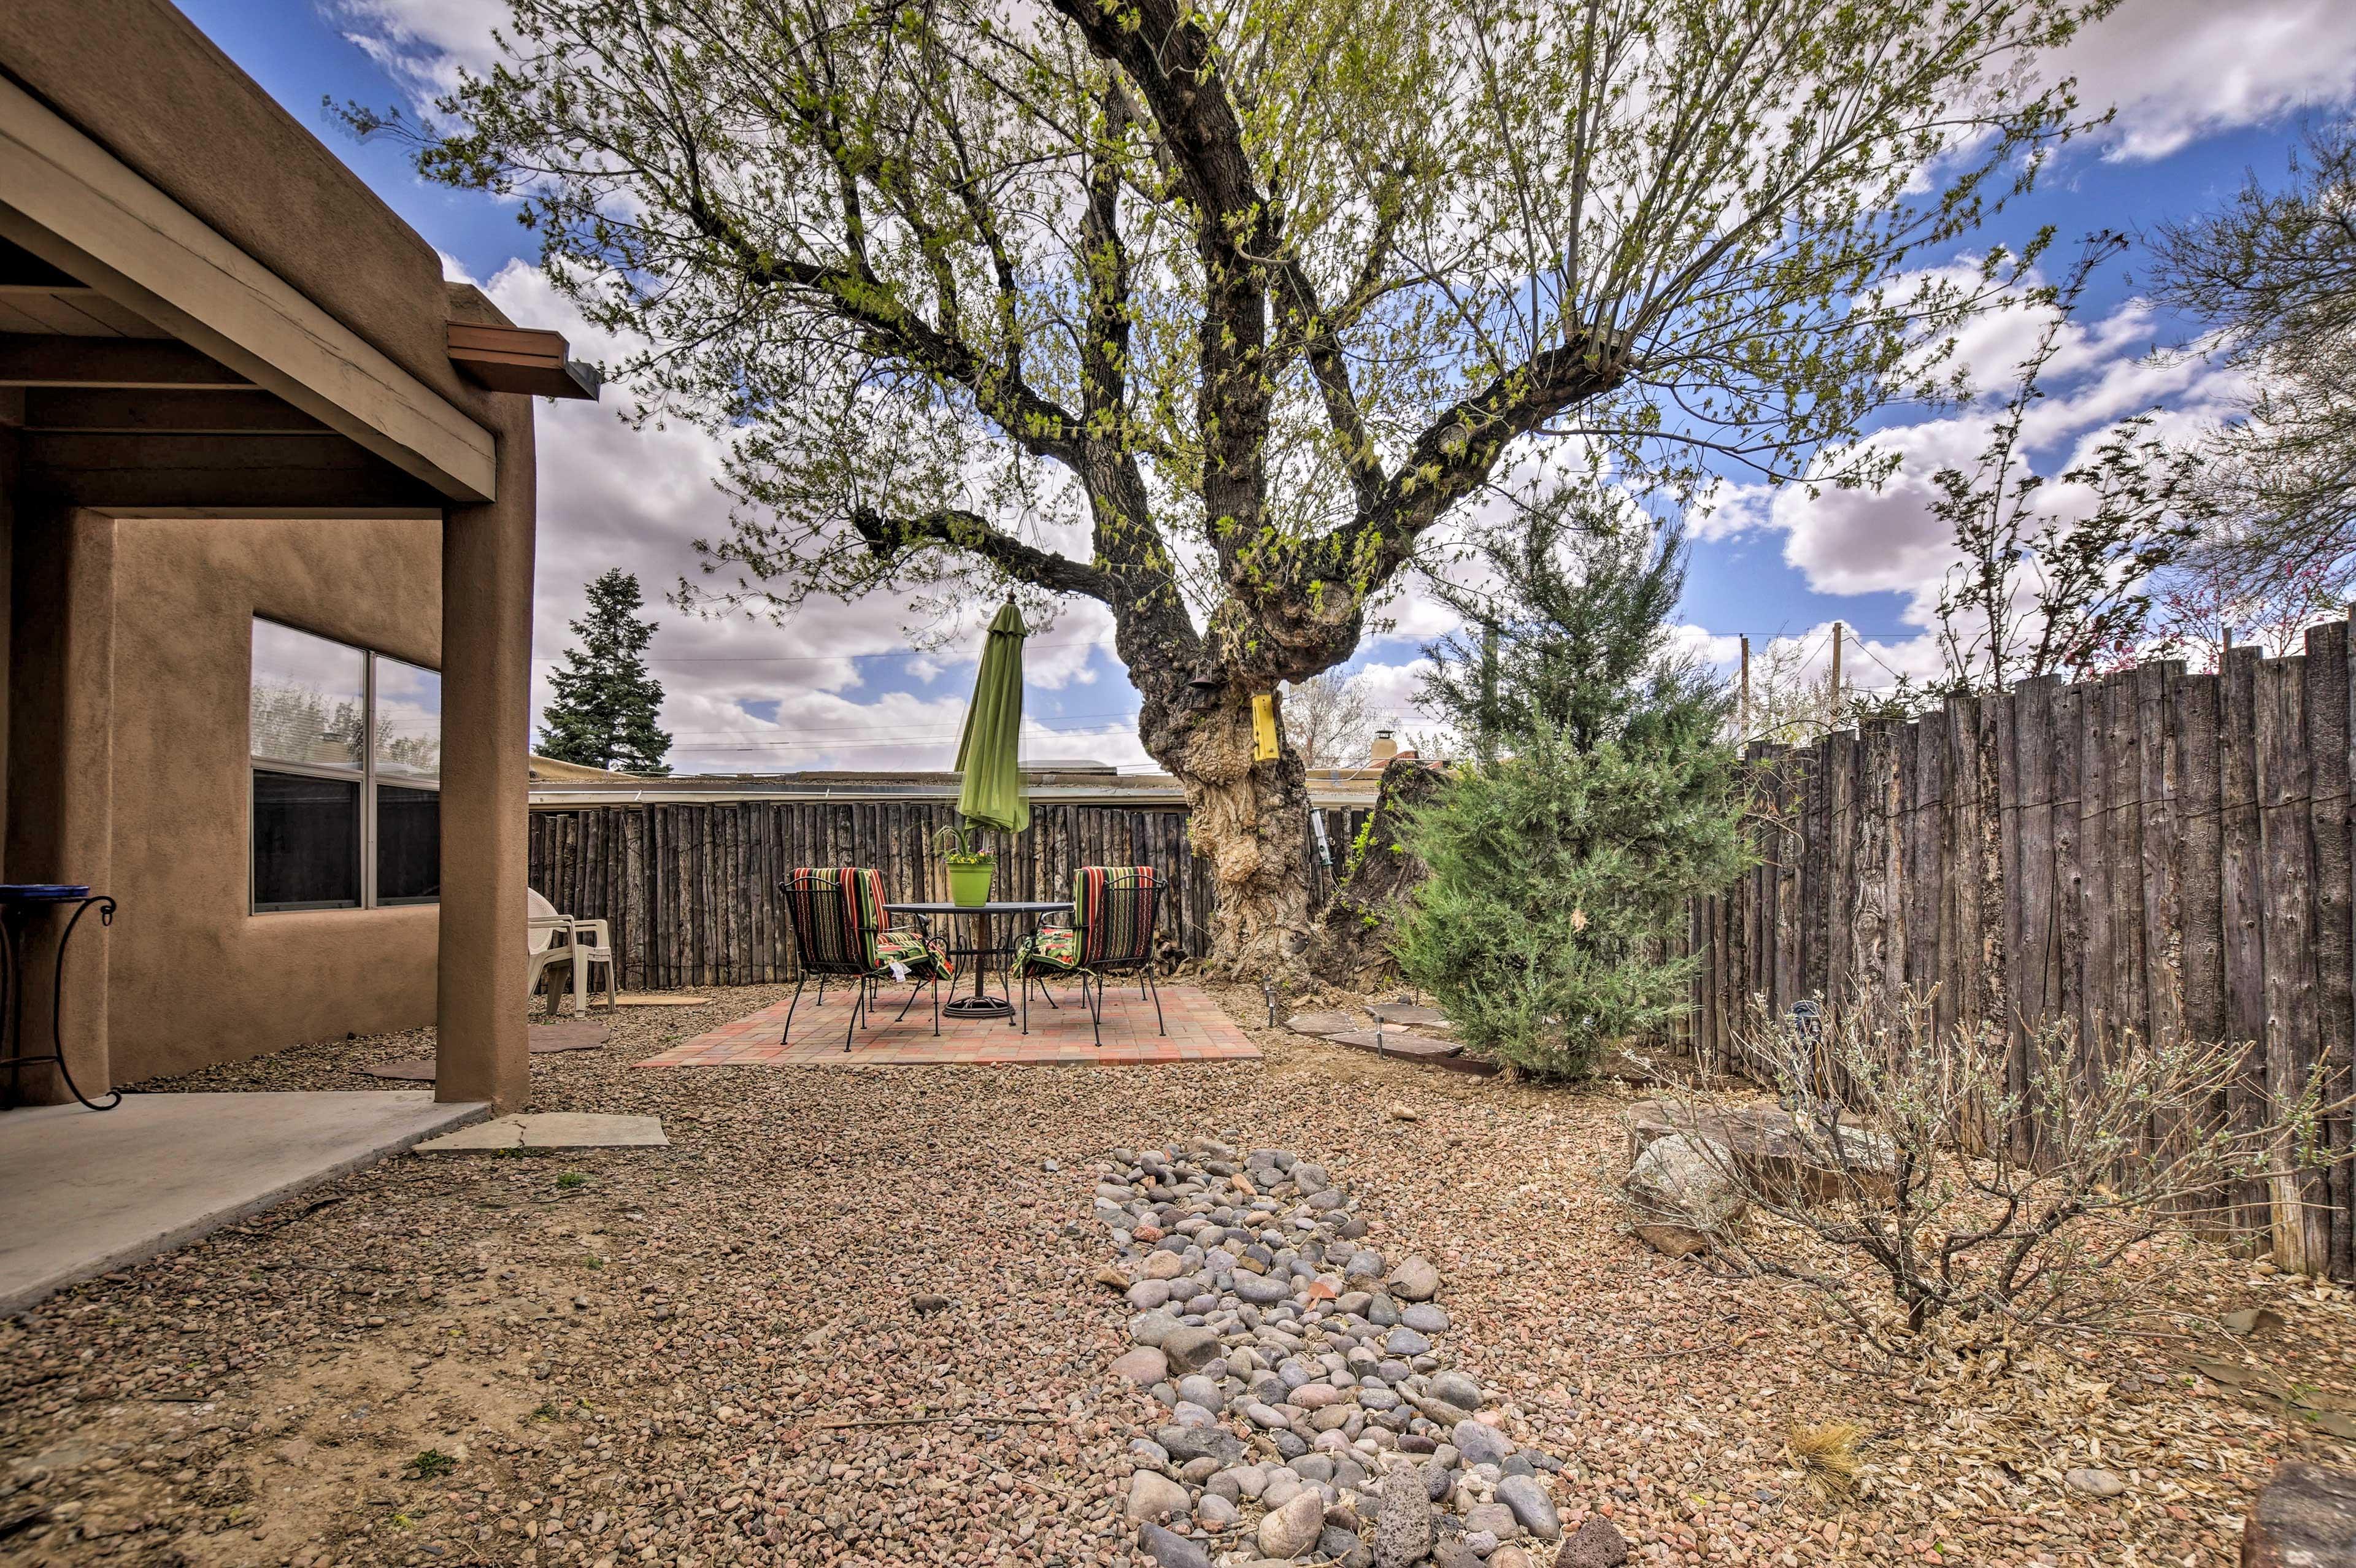 Spend the day in the Santa Fe Plaza or venture to Albuquerque, Taos or Abiquiu.